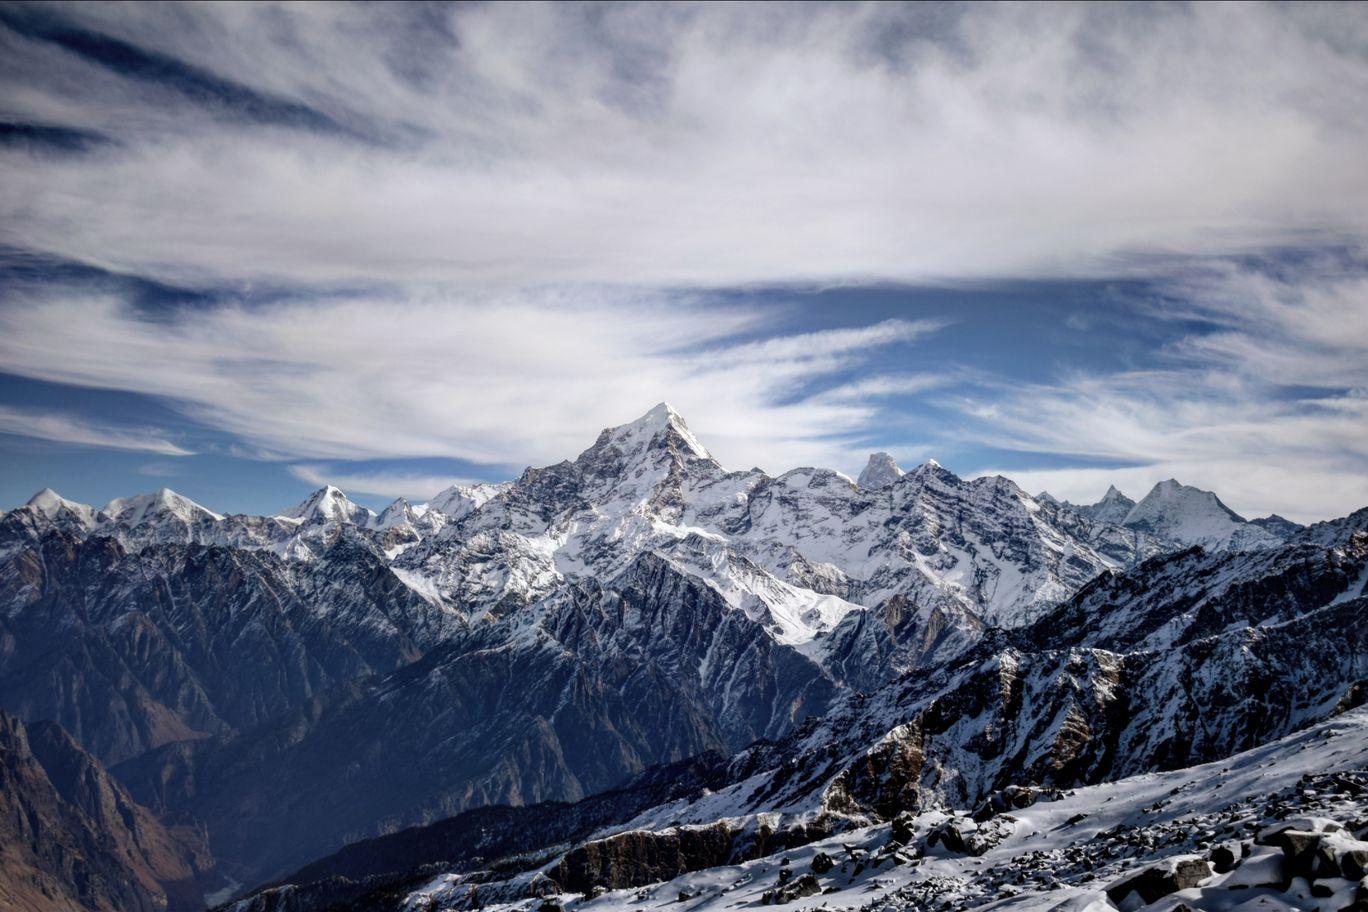 Photo of Pangarchulla Peak By Manvendr Singh Shekhawat